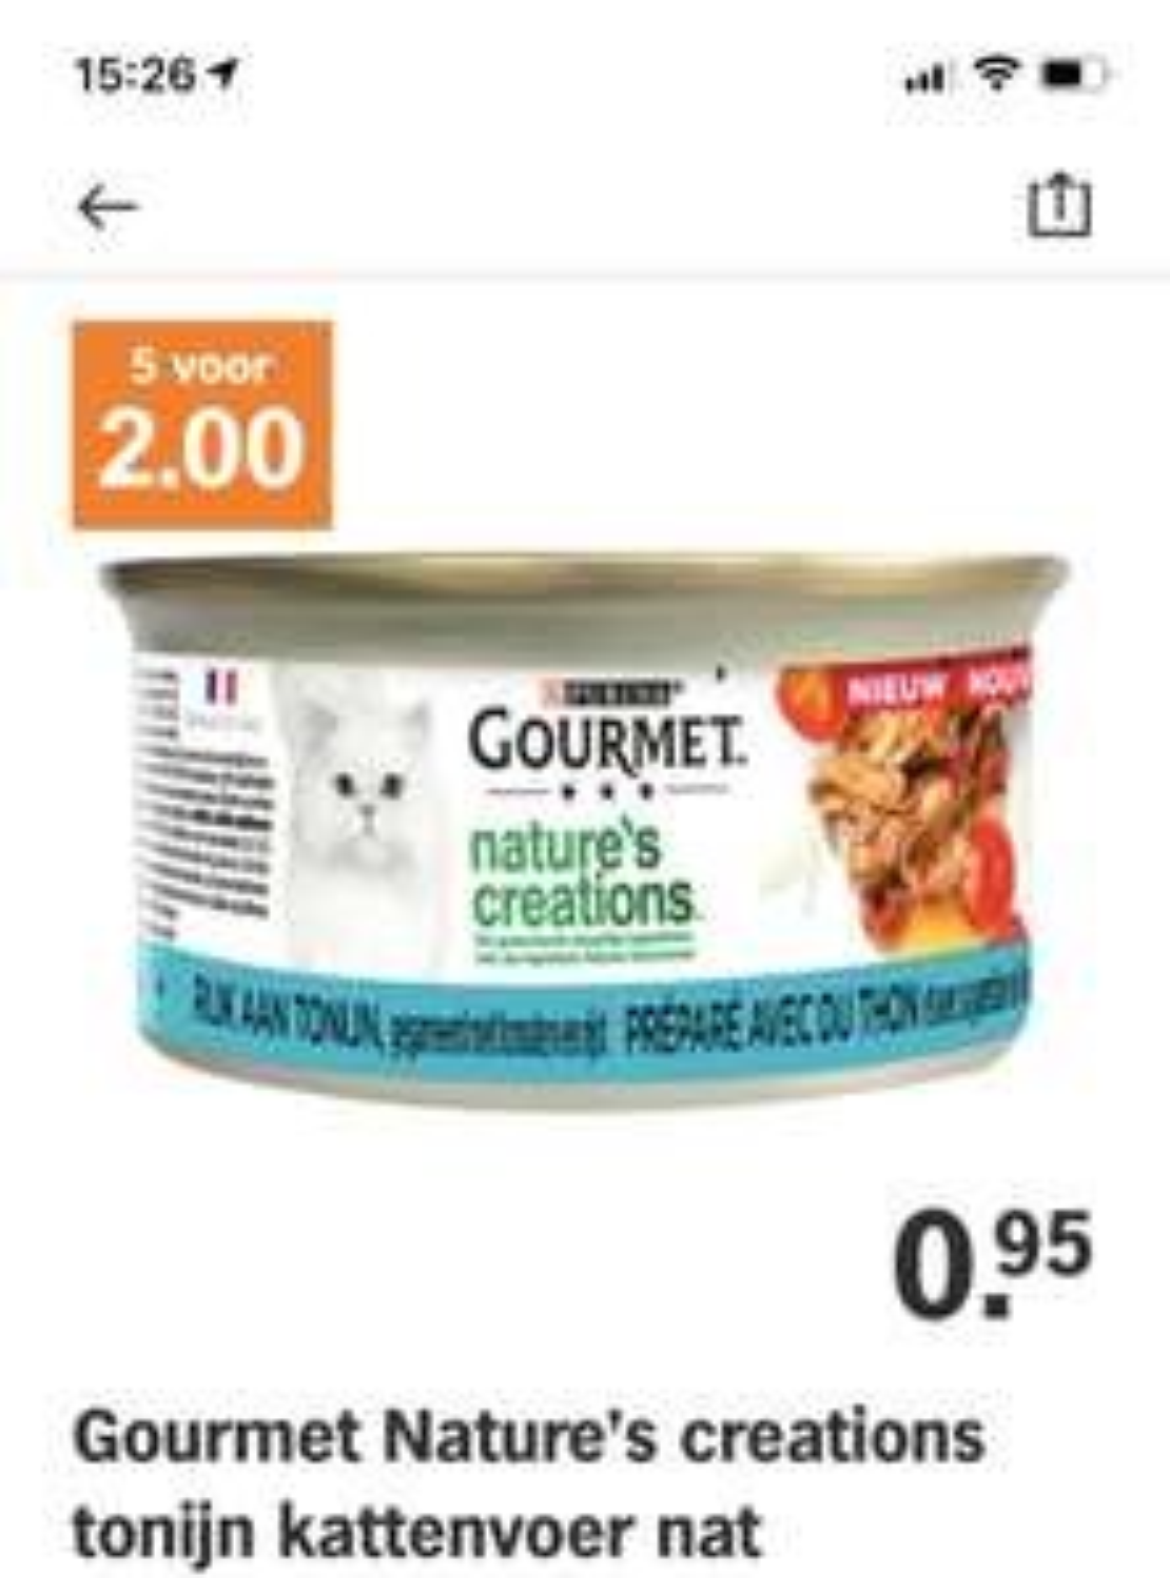 Gourmet natures creations AH Bonus